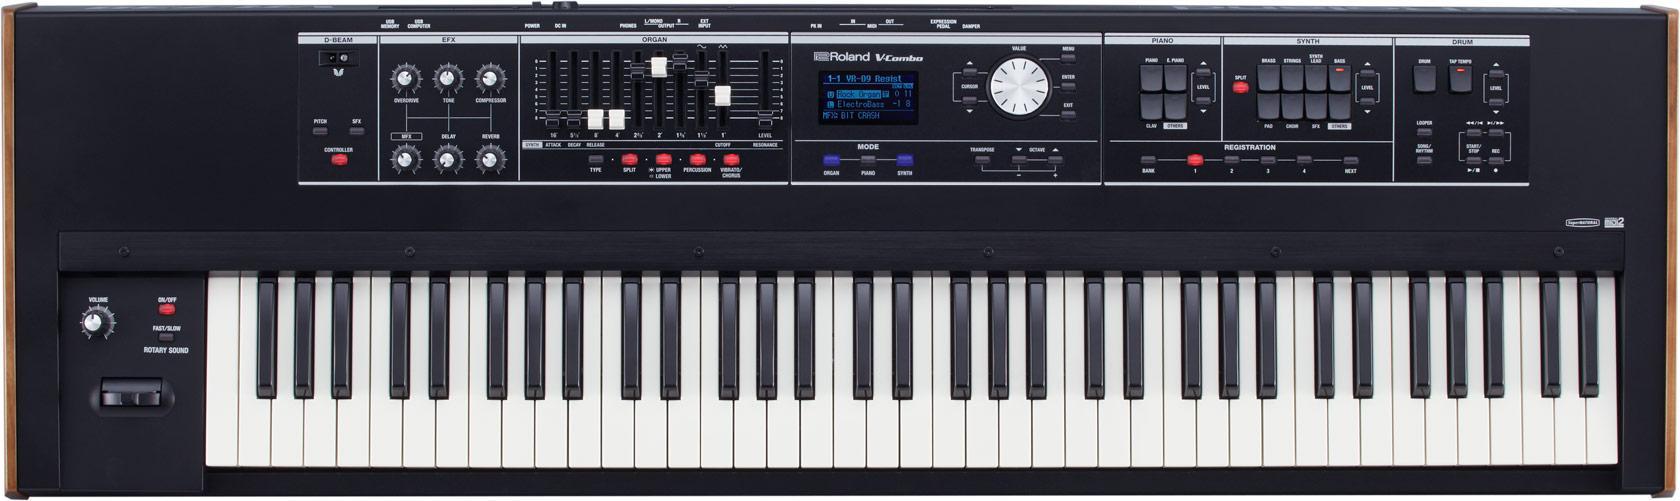 Homekeyboards - Roland VR 730 V Combo Keyboard Live Performance Keyboard - Onlineshop Musikhaus Kirstein